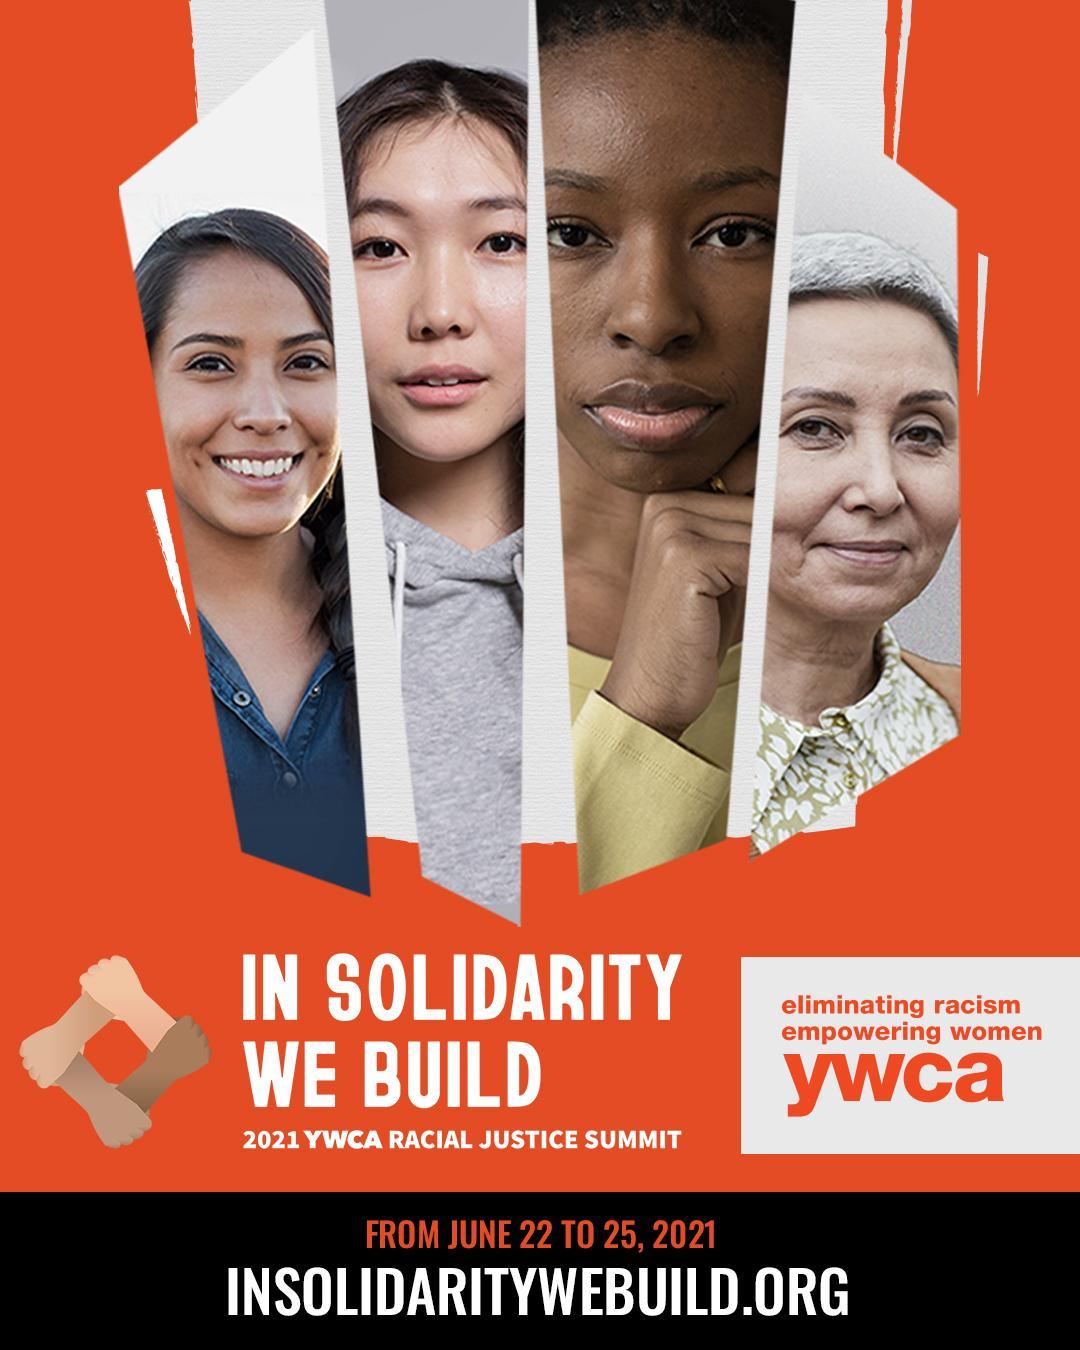 YWCA In Solidarity We Build